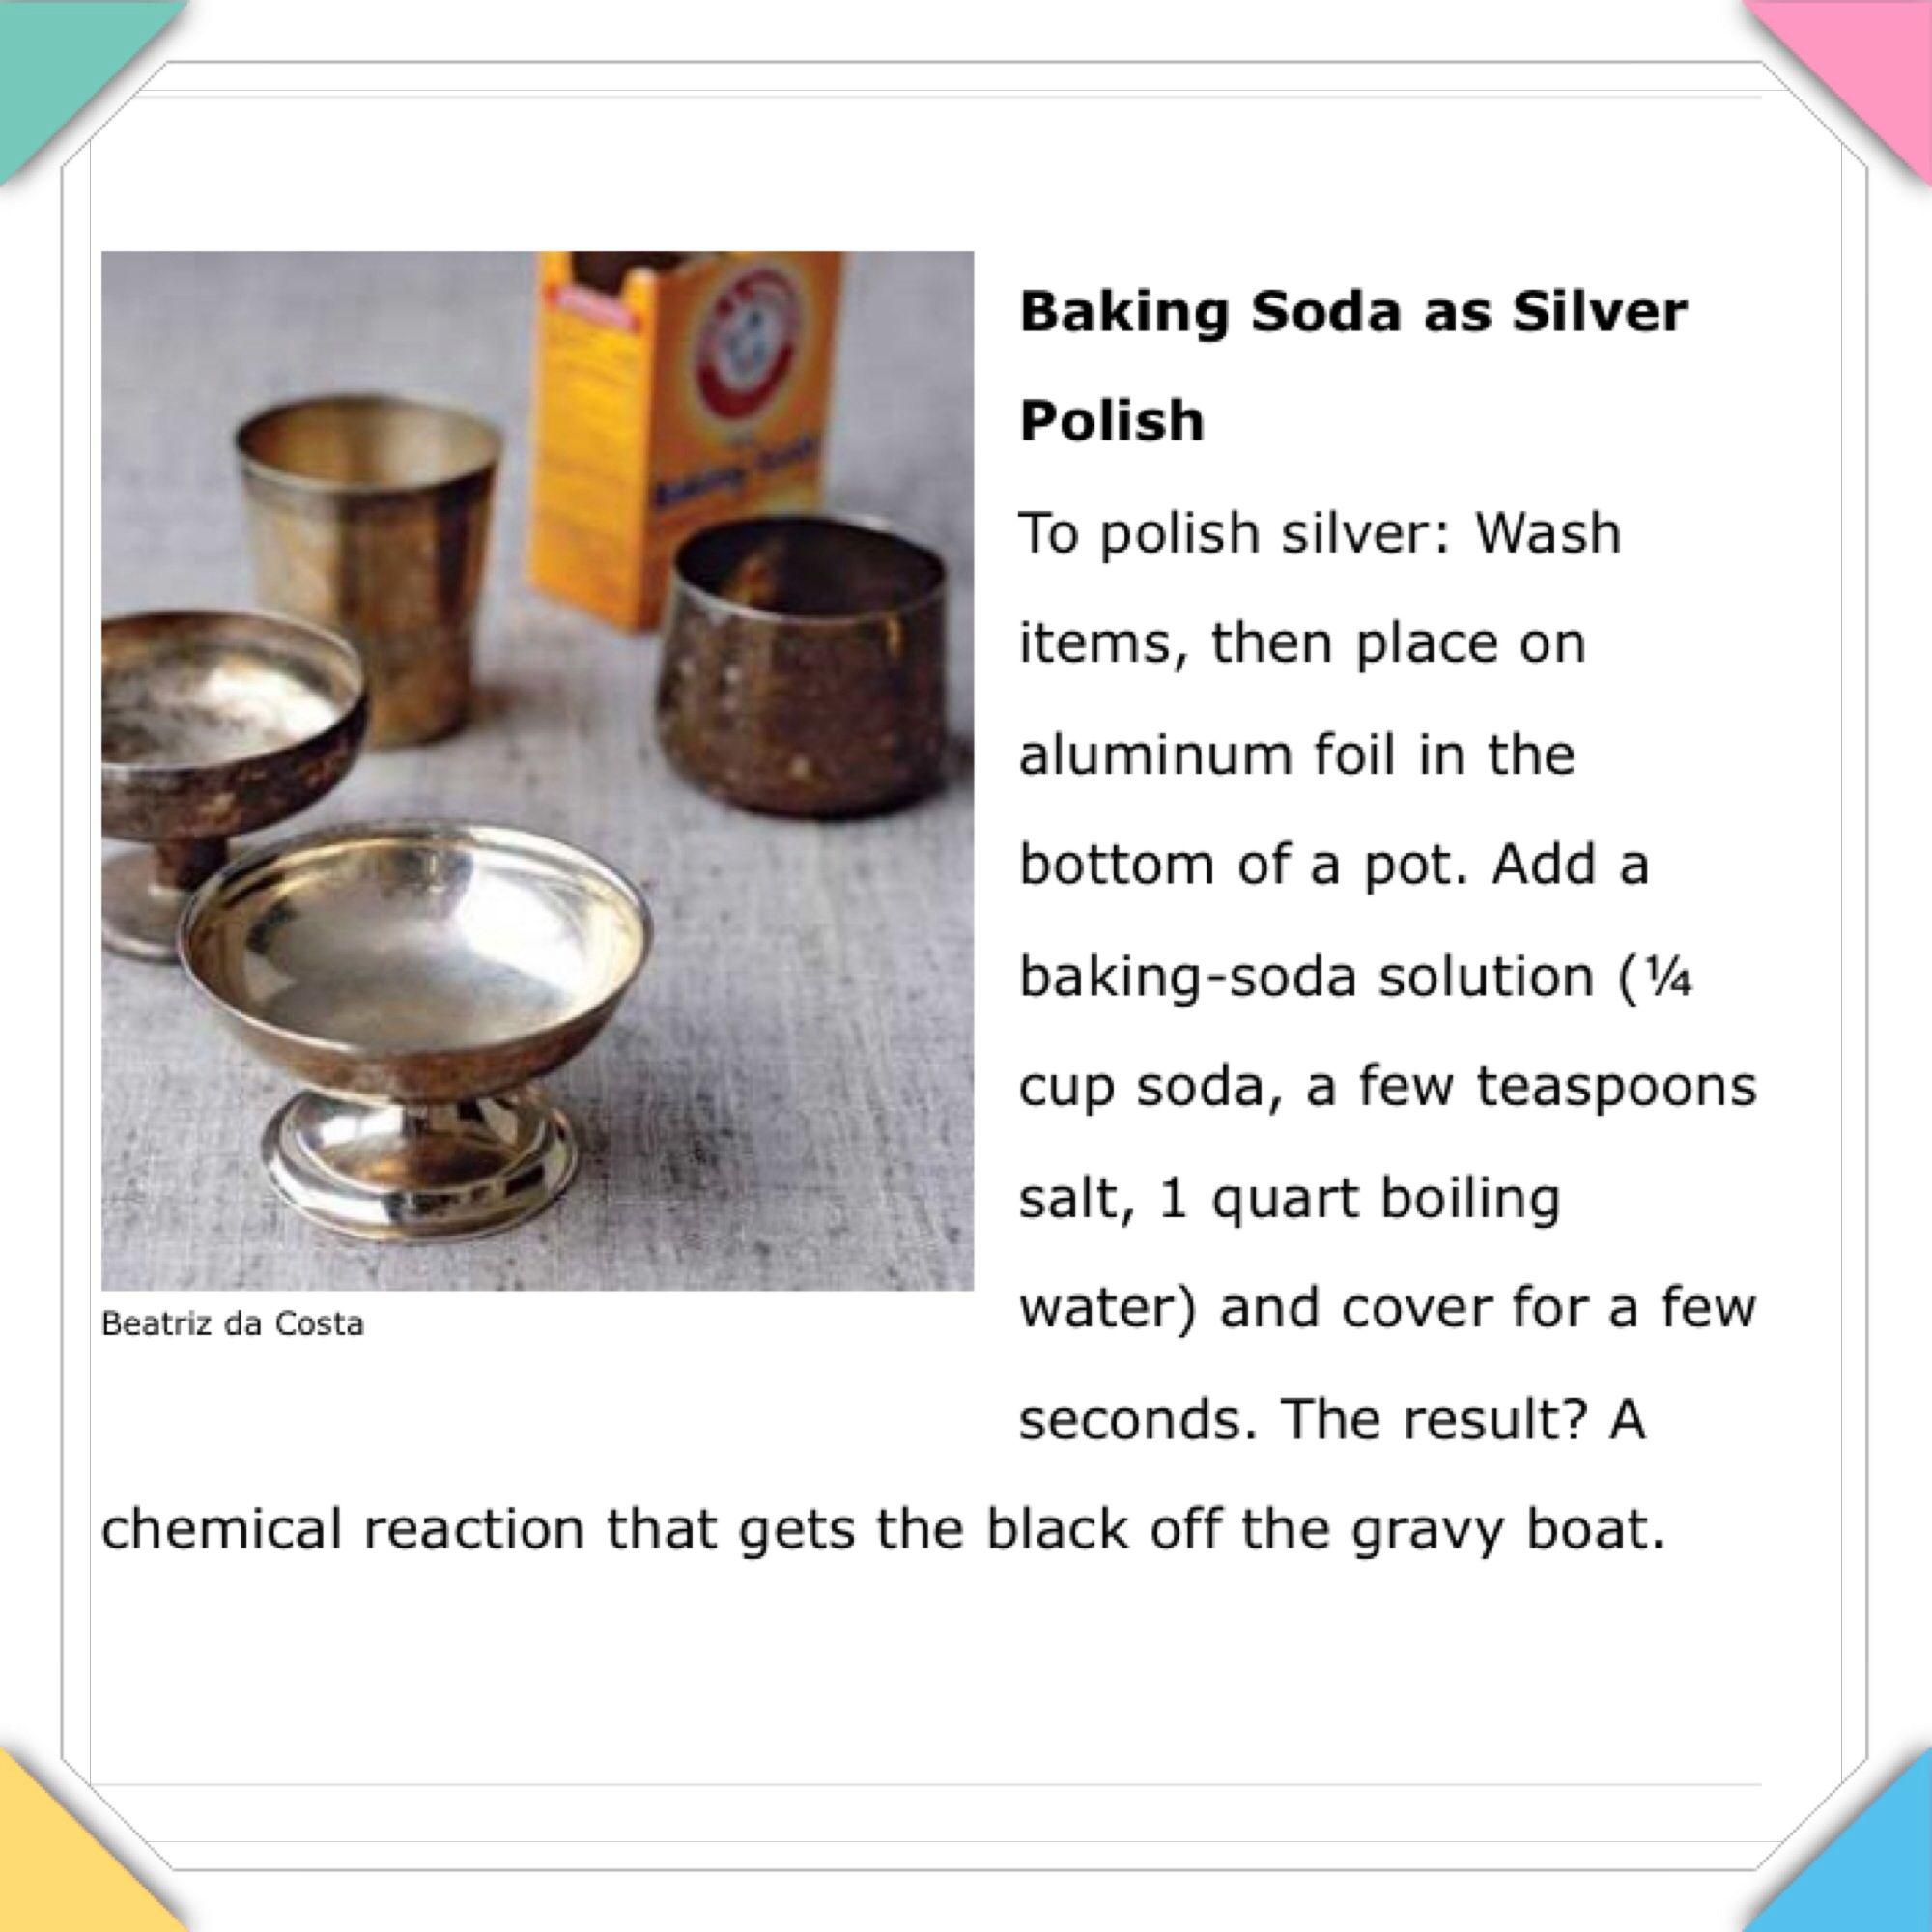 Shining that silver Baking soda solutions